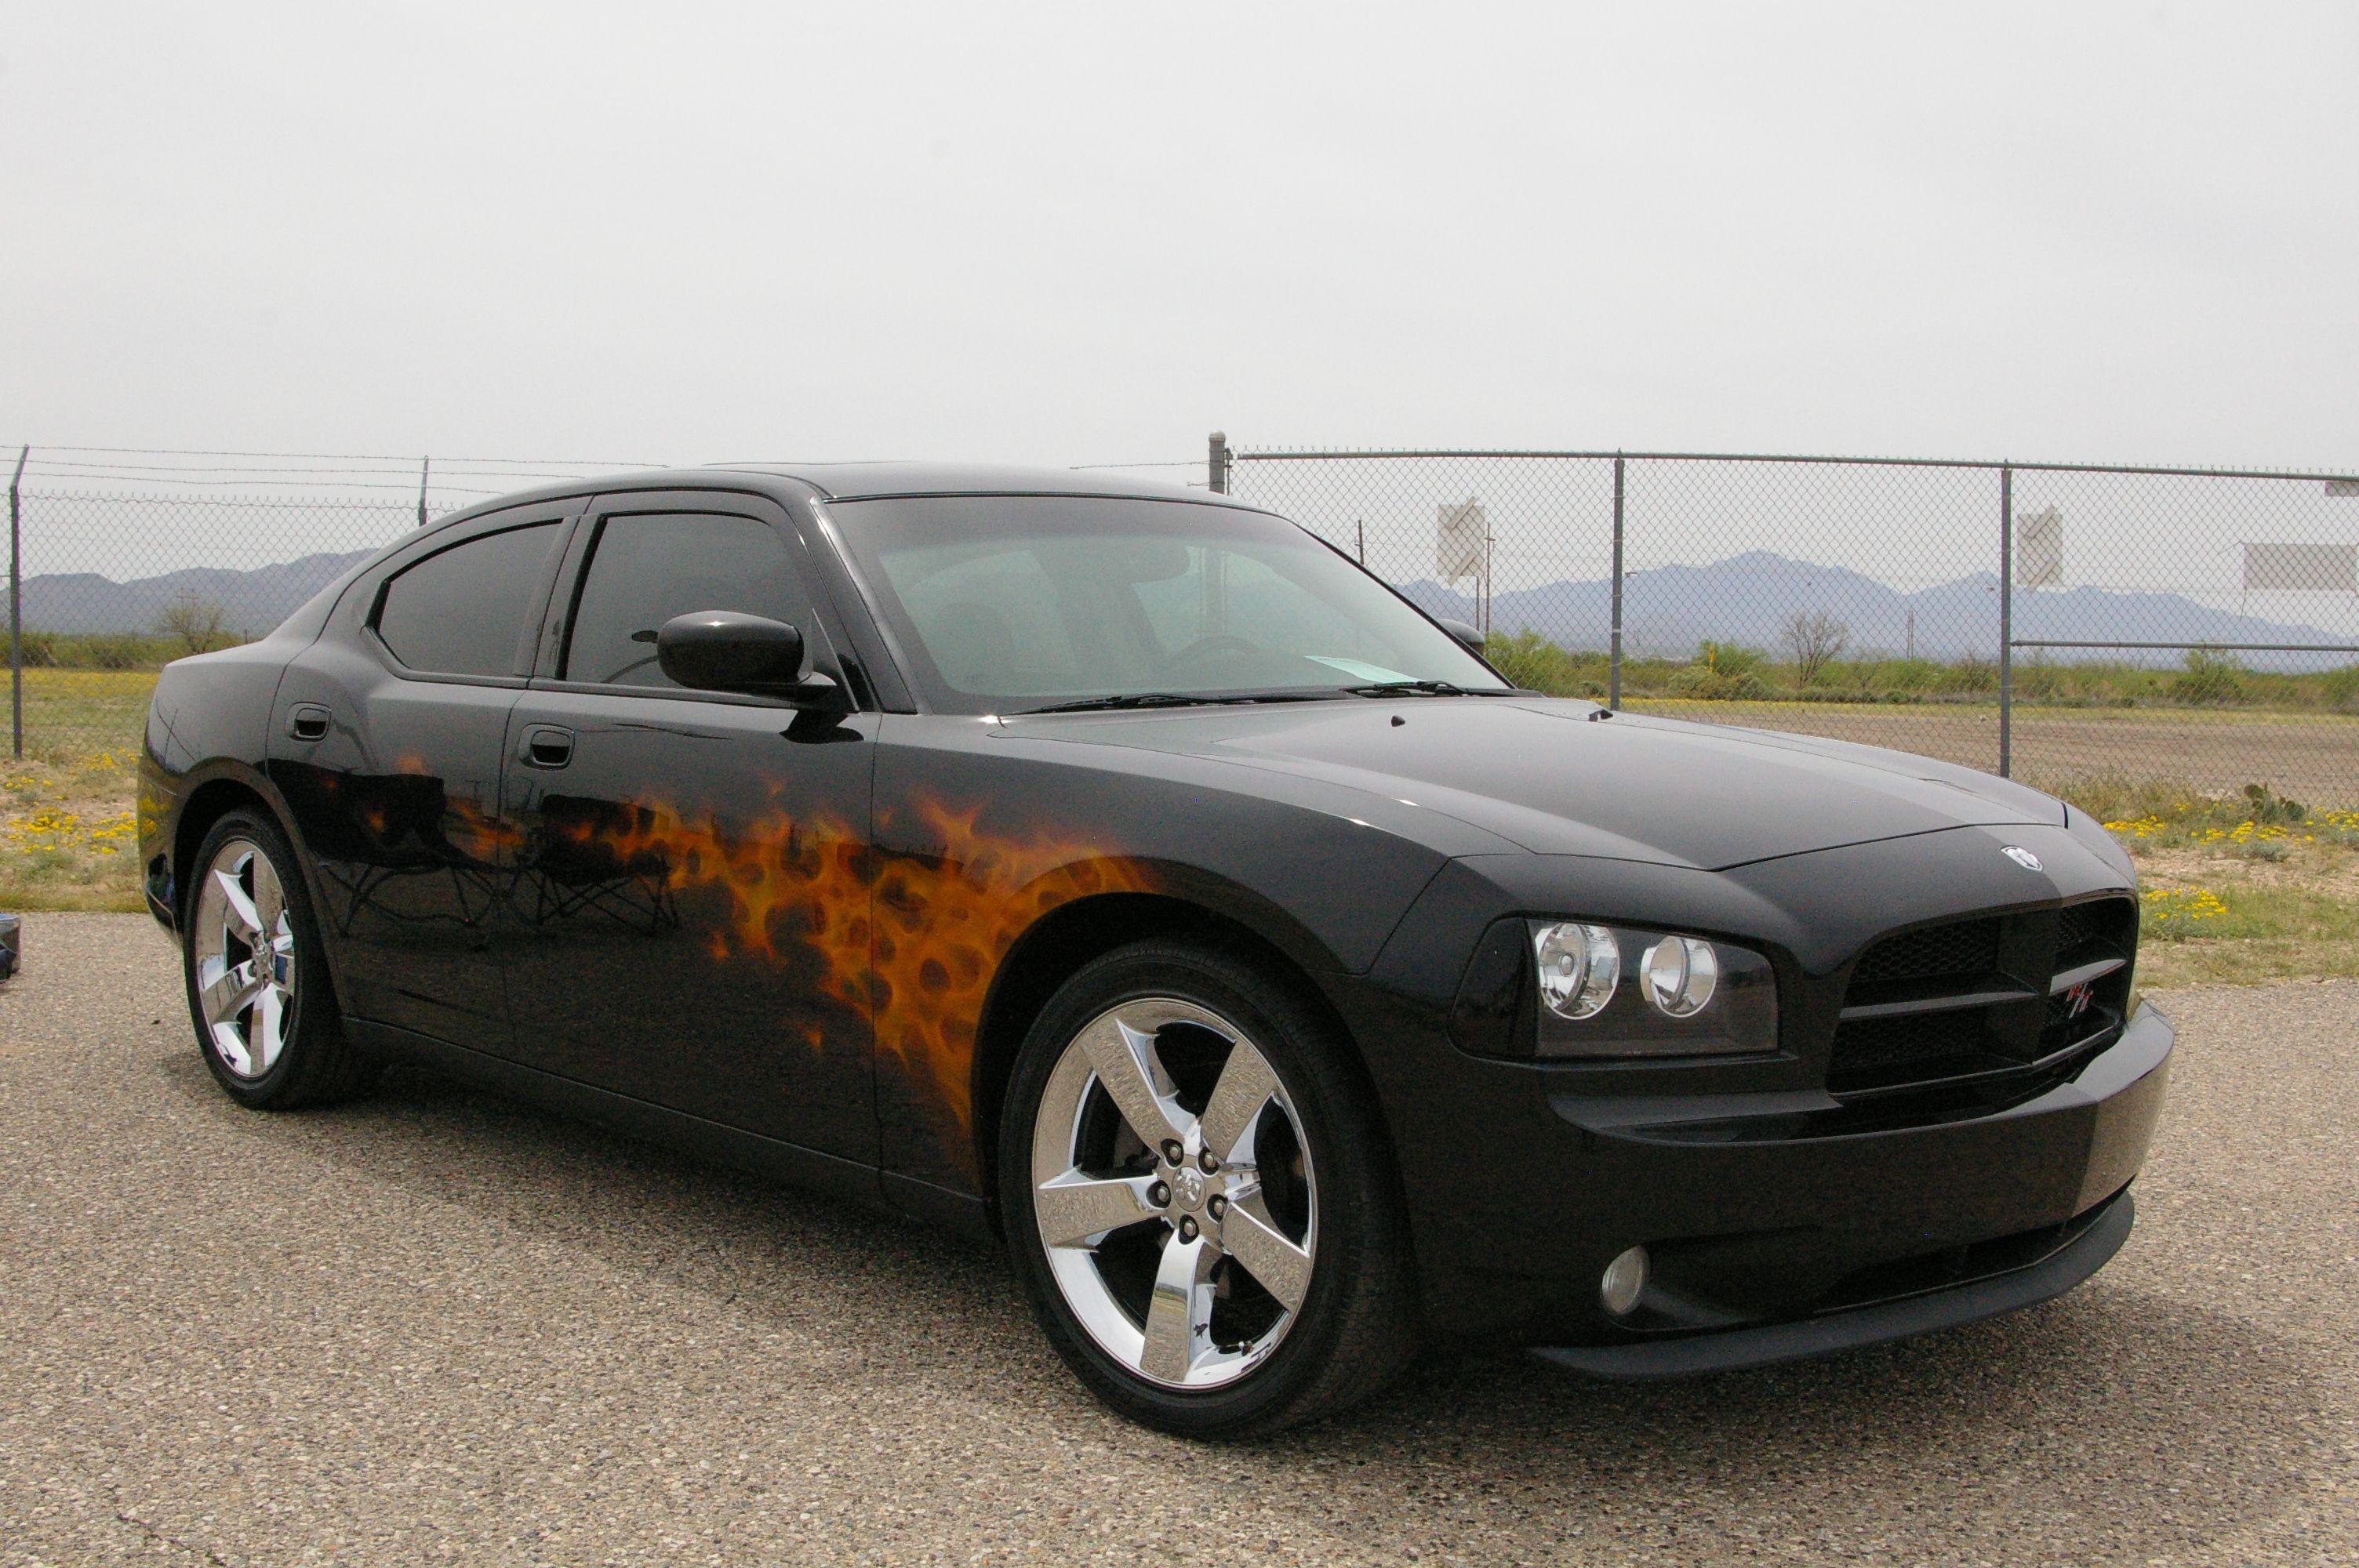 2008 Dodge Charger R T DIBM Tuner VS Muscle Show Tucson Az 2010